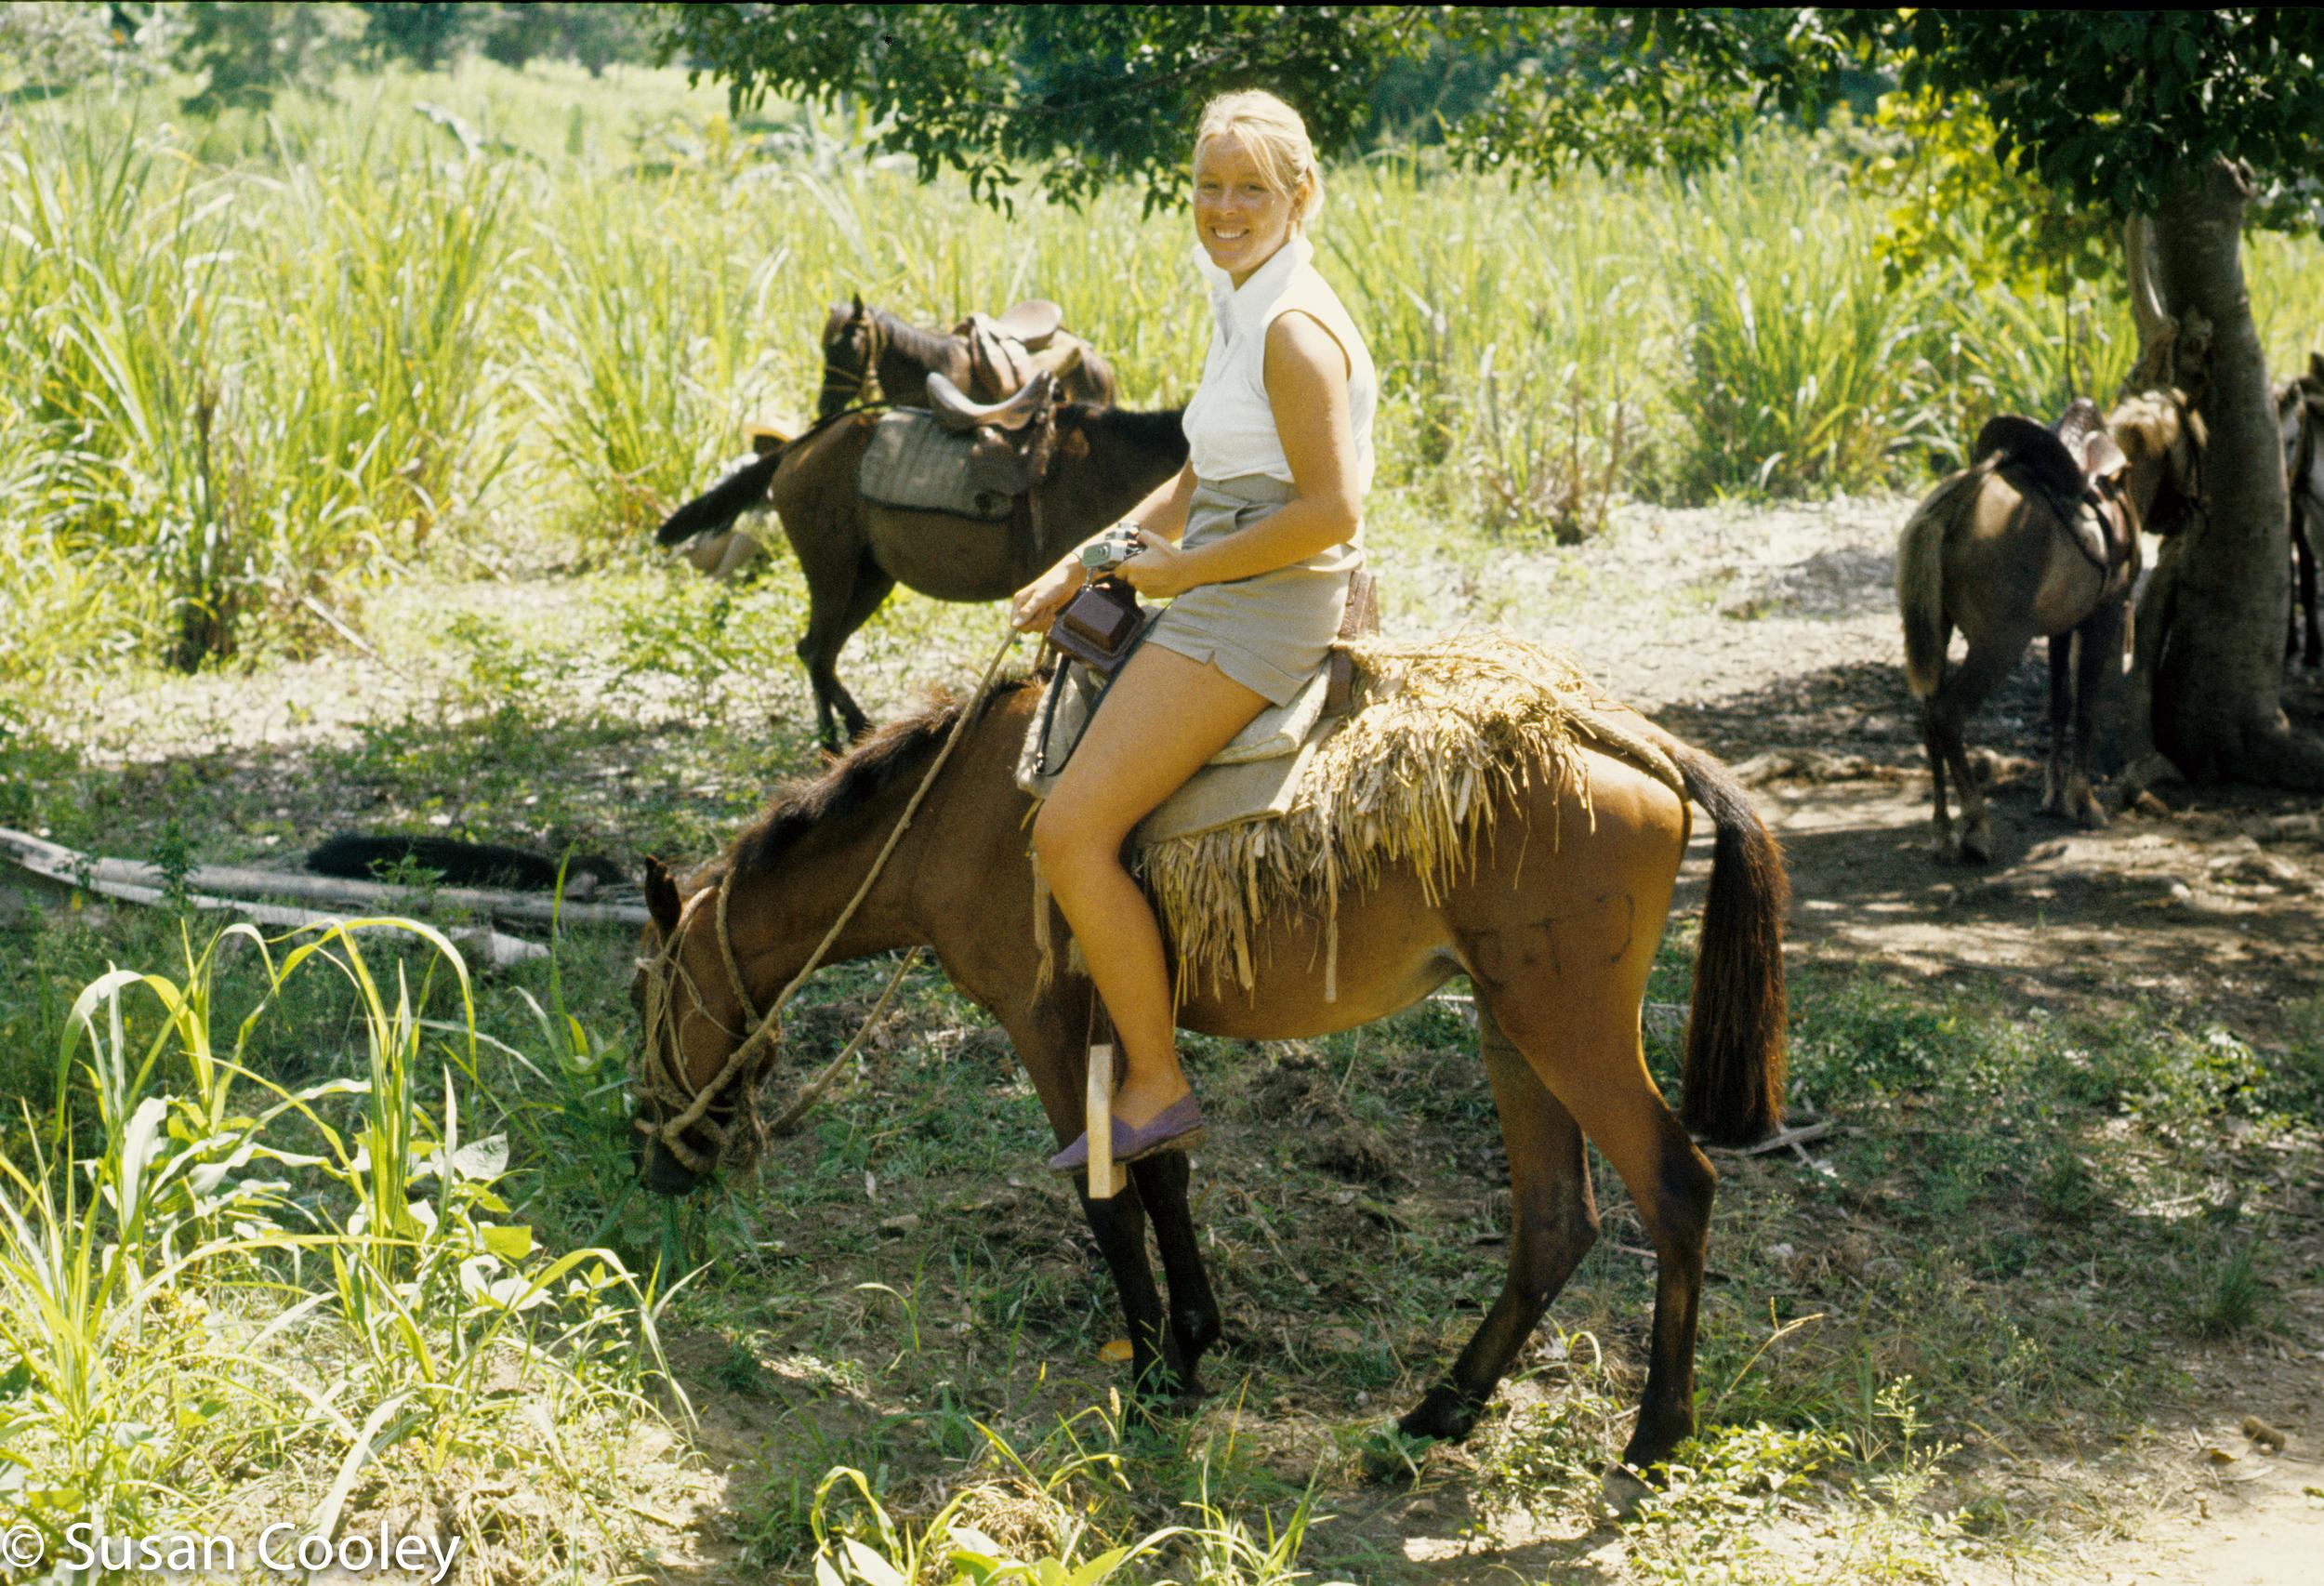 Susan en route to feeding station, Haiti, 1974.